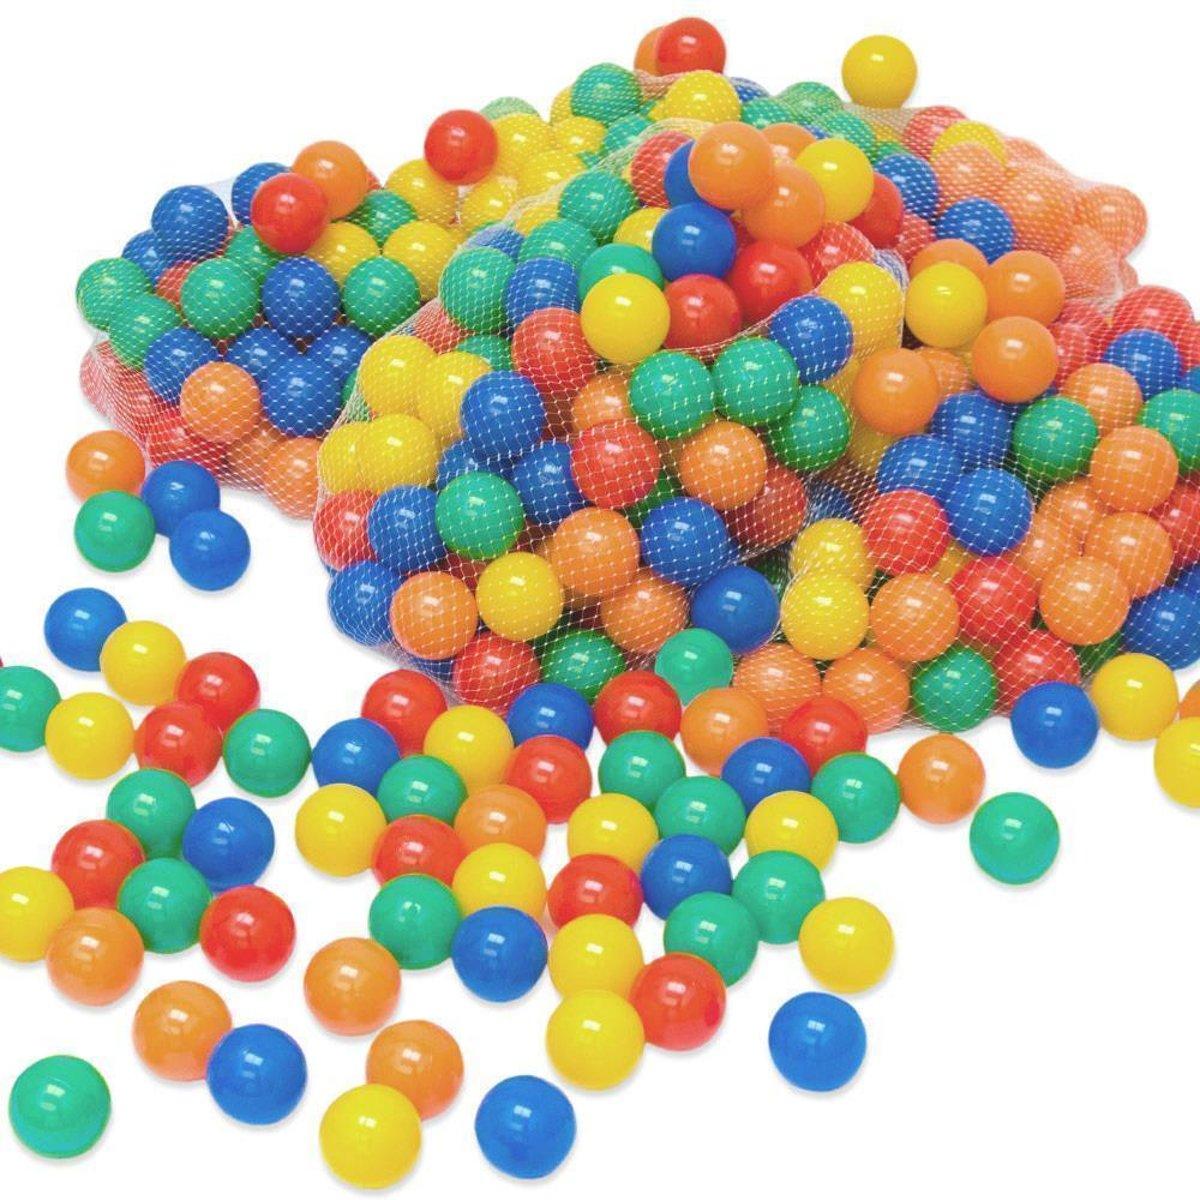 Kogelballen 6 cm diameter 1000 ballen